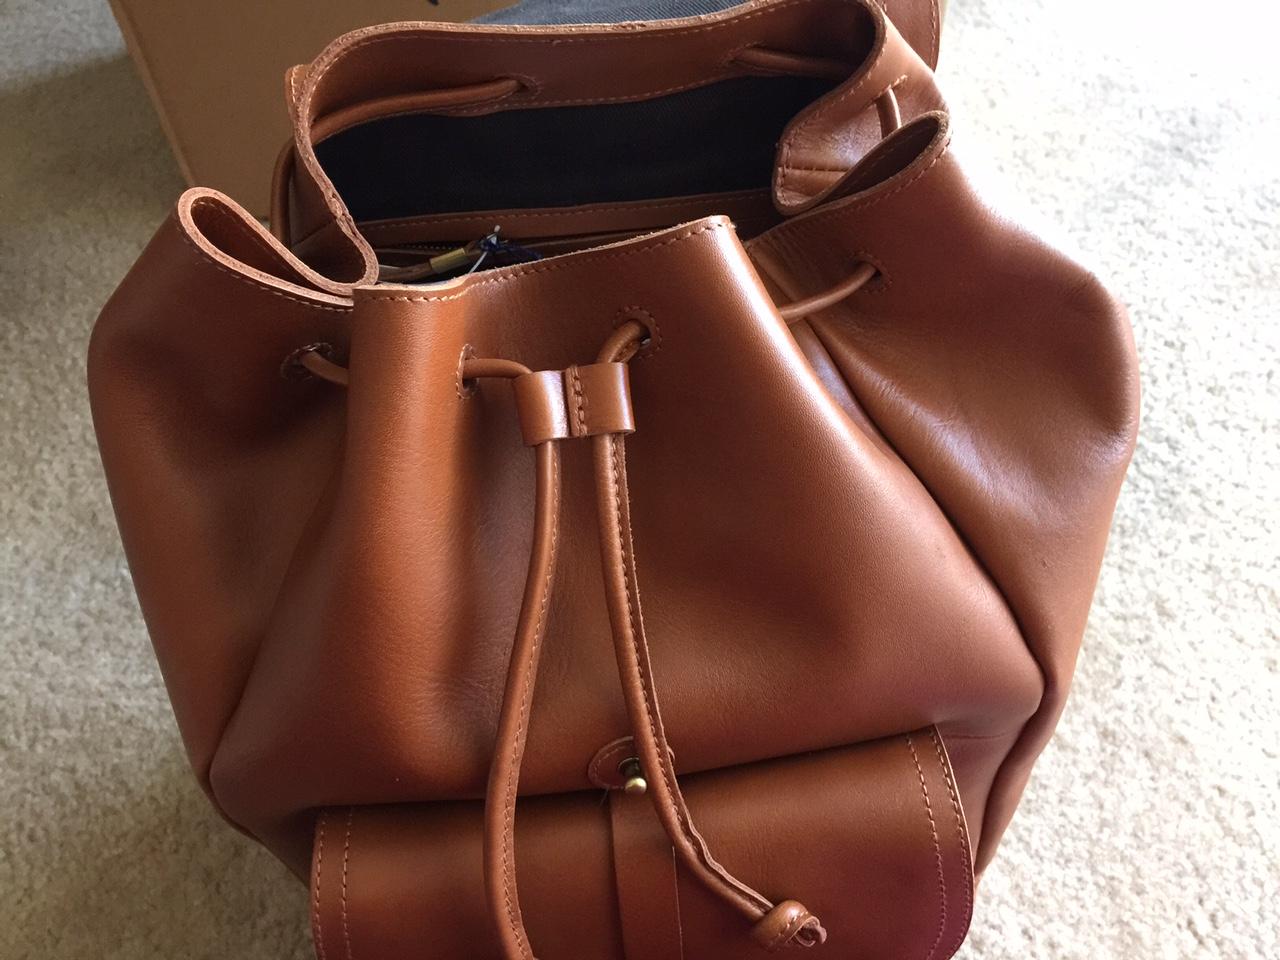 Madewell Transport Rucksack Backpack